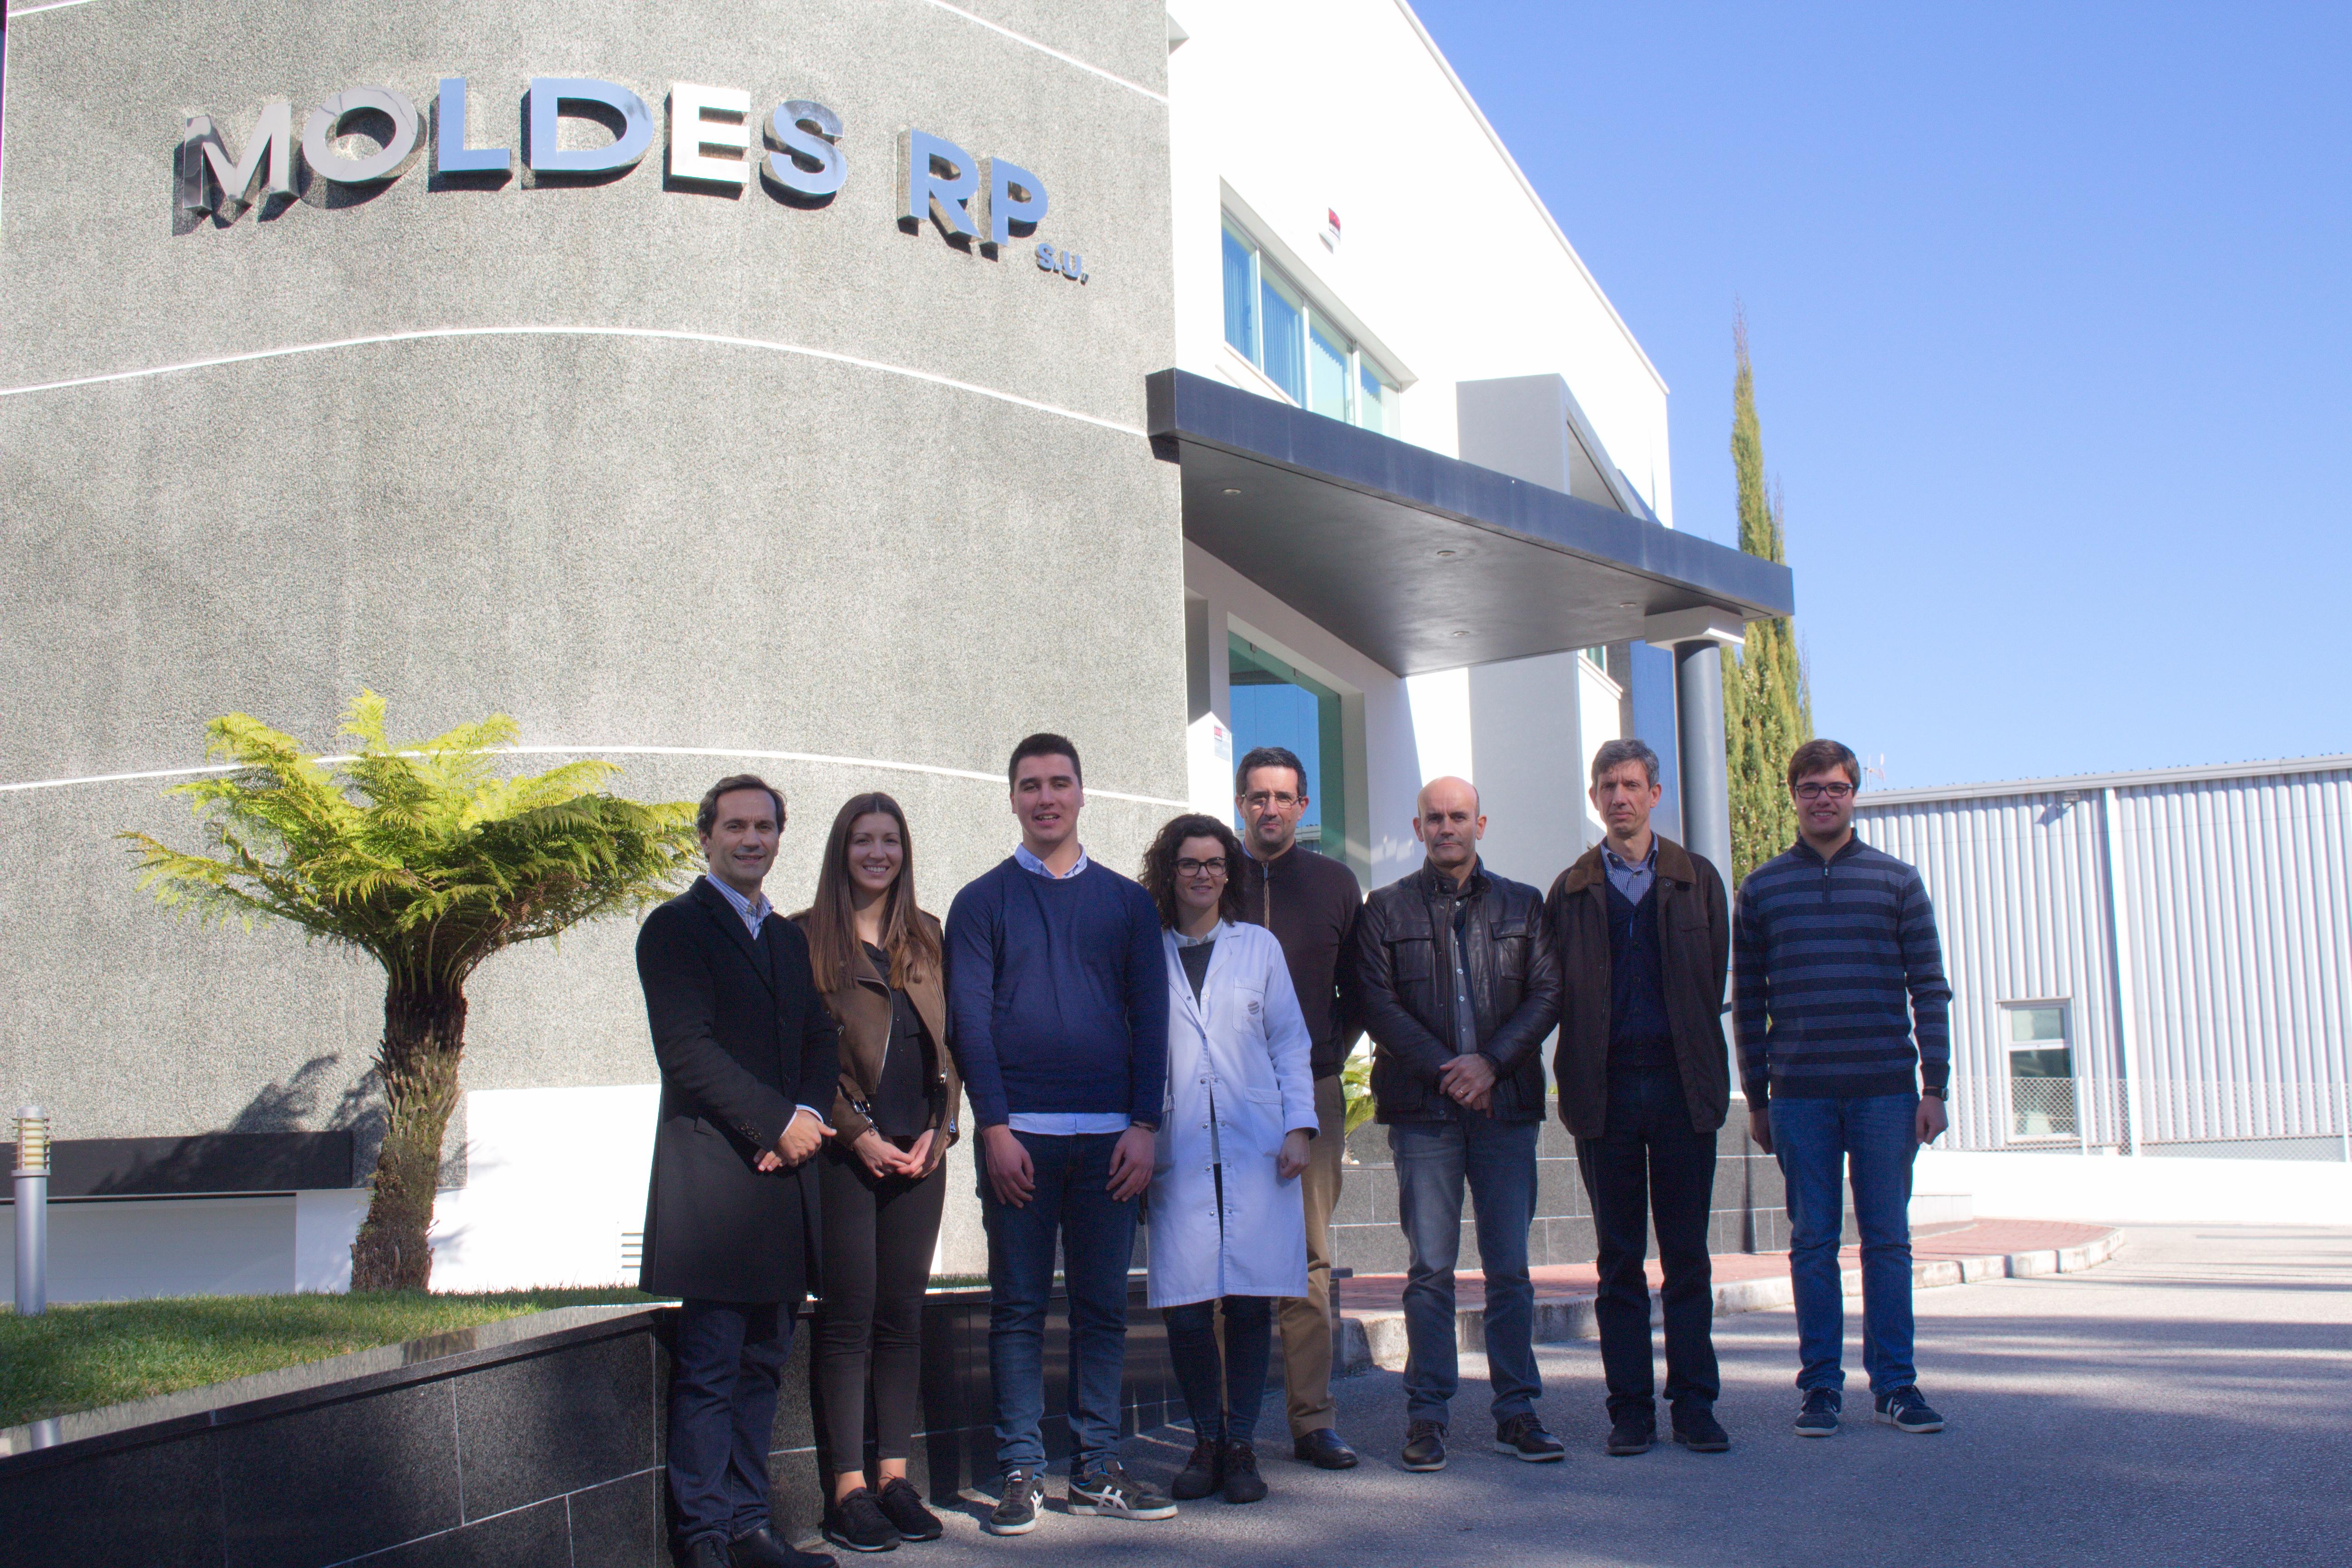 Visita à empresa Moldes RP